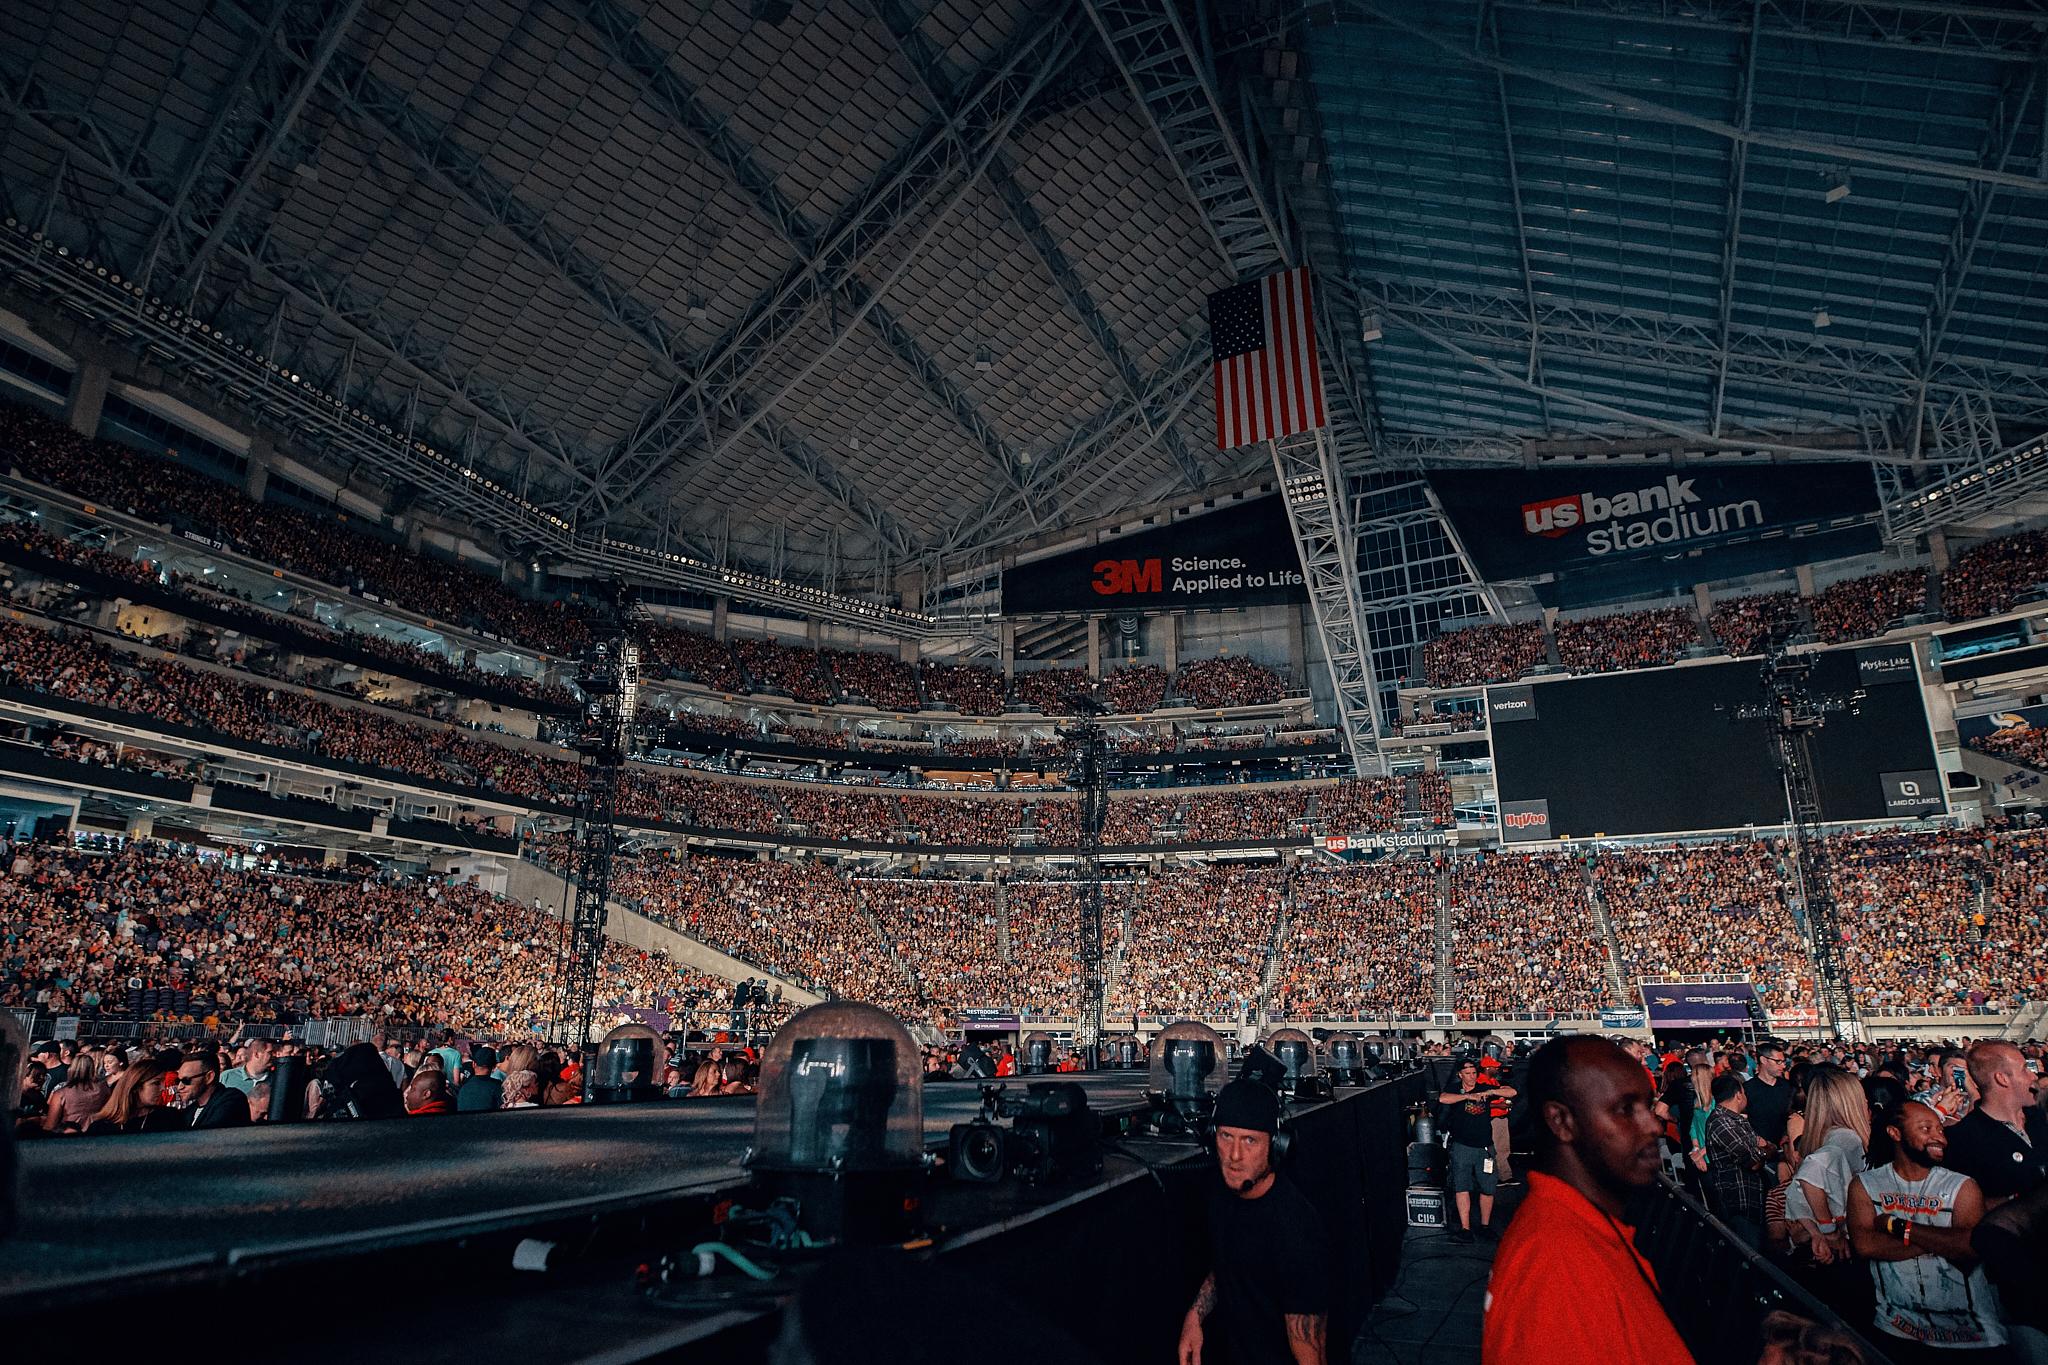 Coldplay_US_Bank_Stadium_Minneapolis_Minnesota_Photography_By_Joe_Lemke_034.JPG